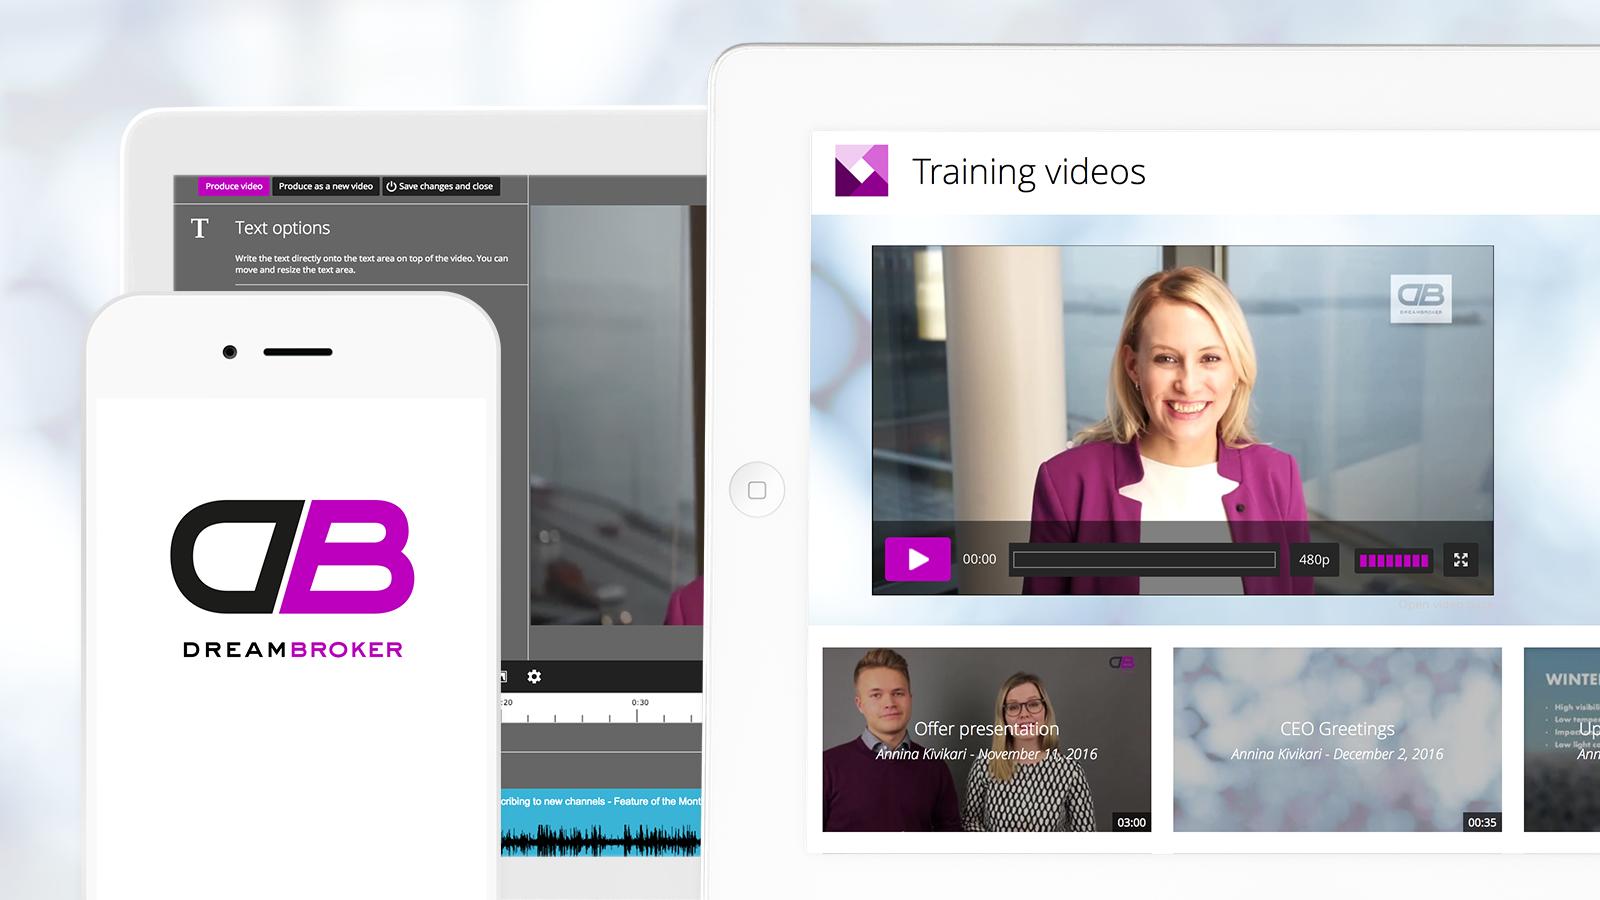 dream-broker-studio-new-way-of-communication-and-leadership